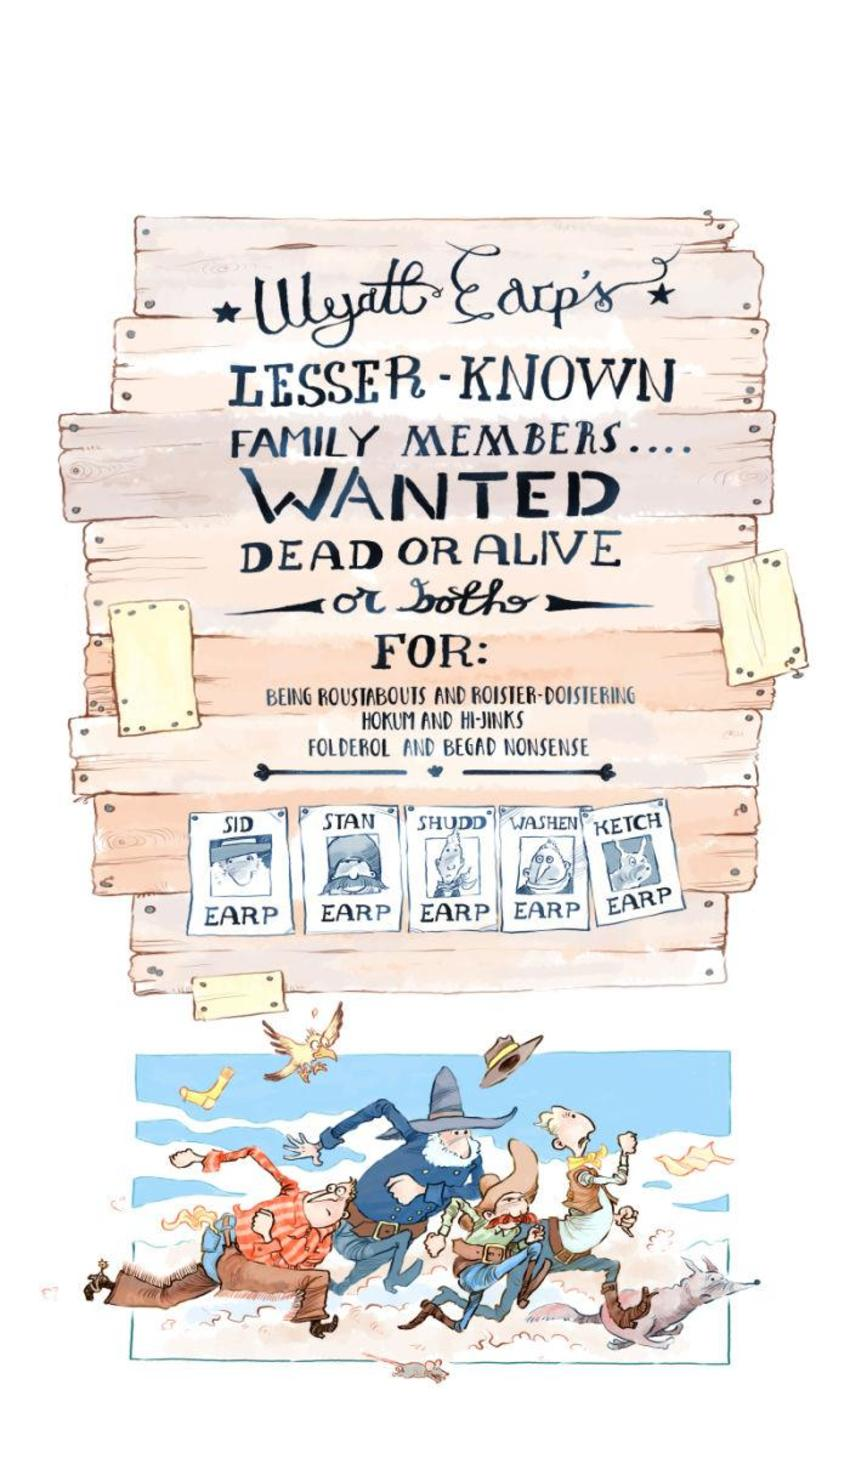 Jon Davis - Cowboys, Wanted Posters, Running, Posse, Text-01 Copy